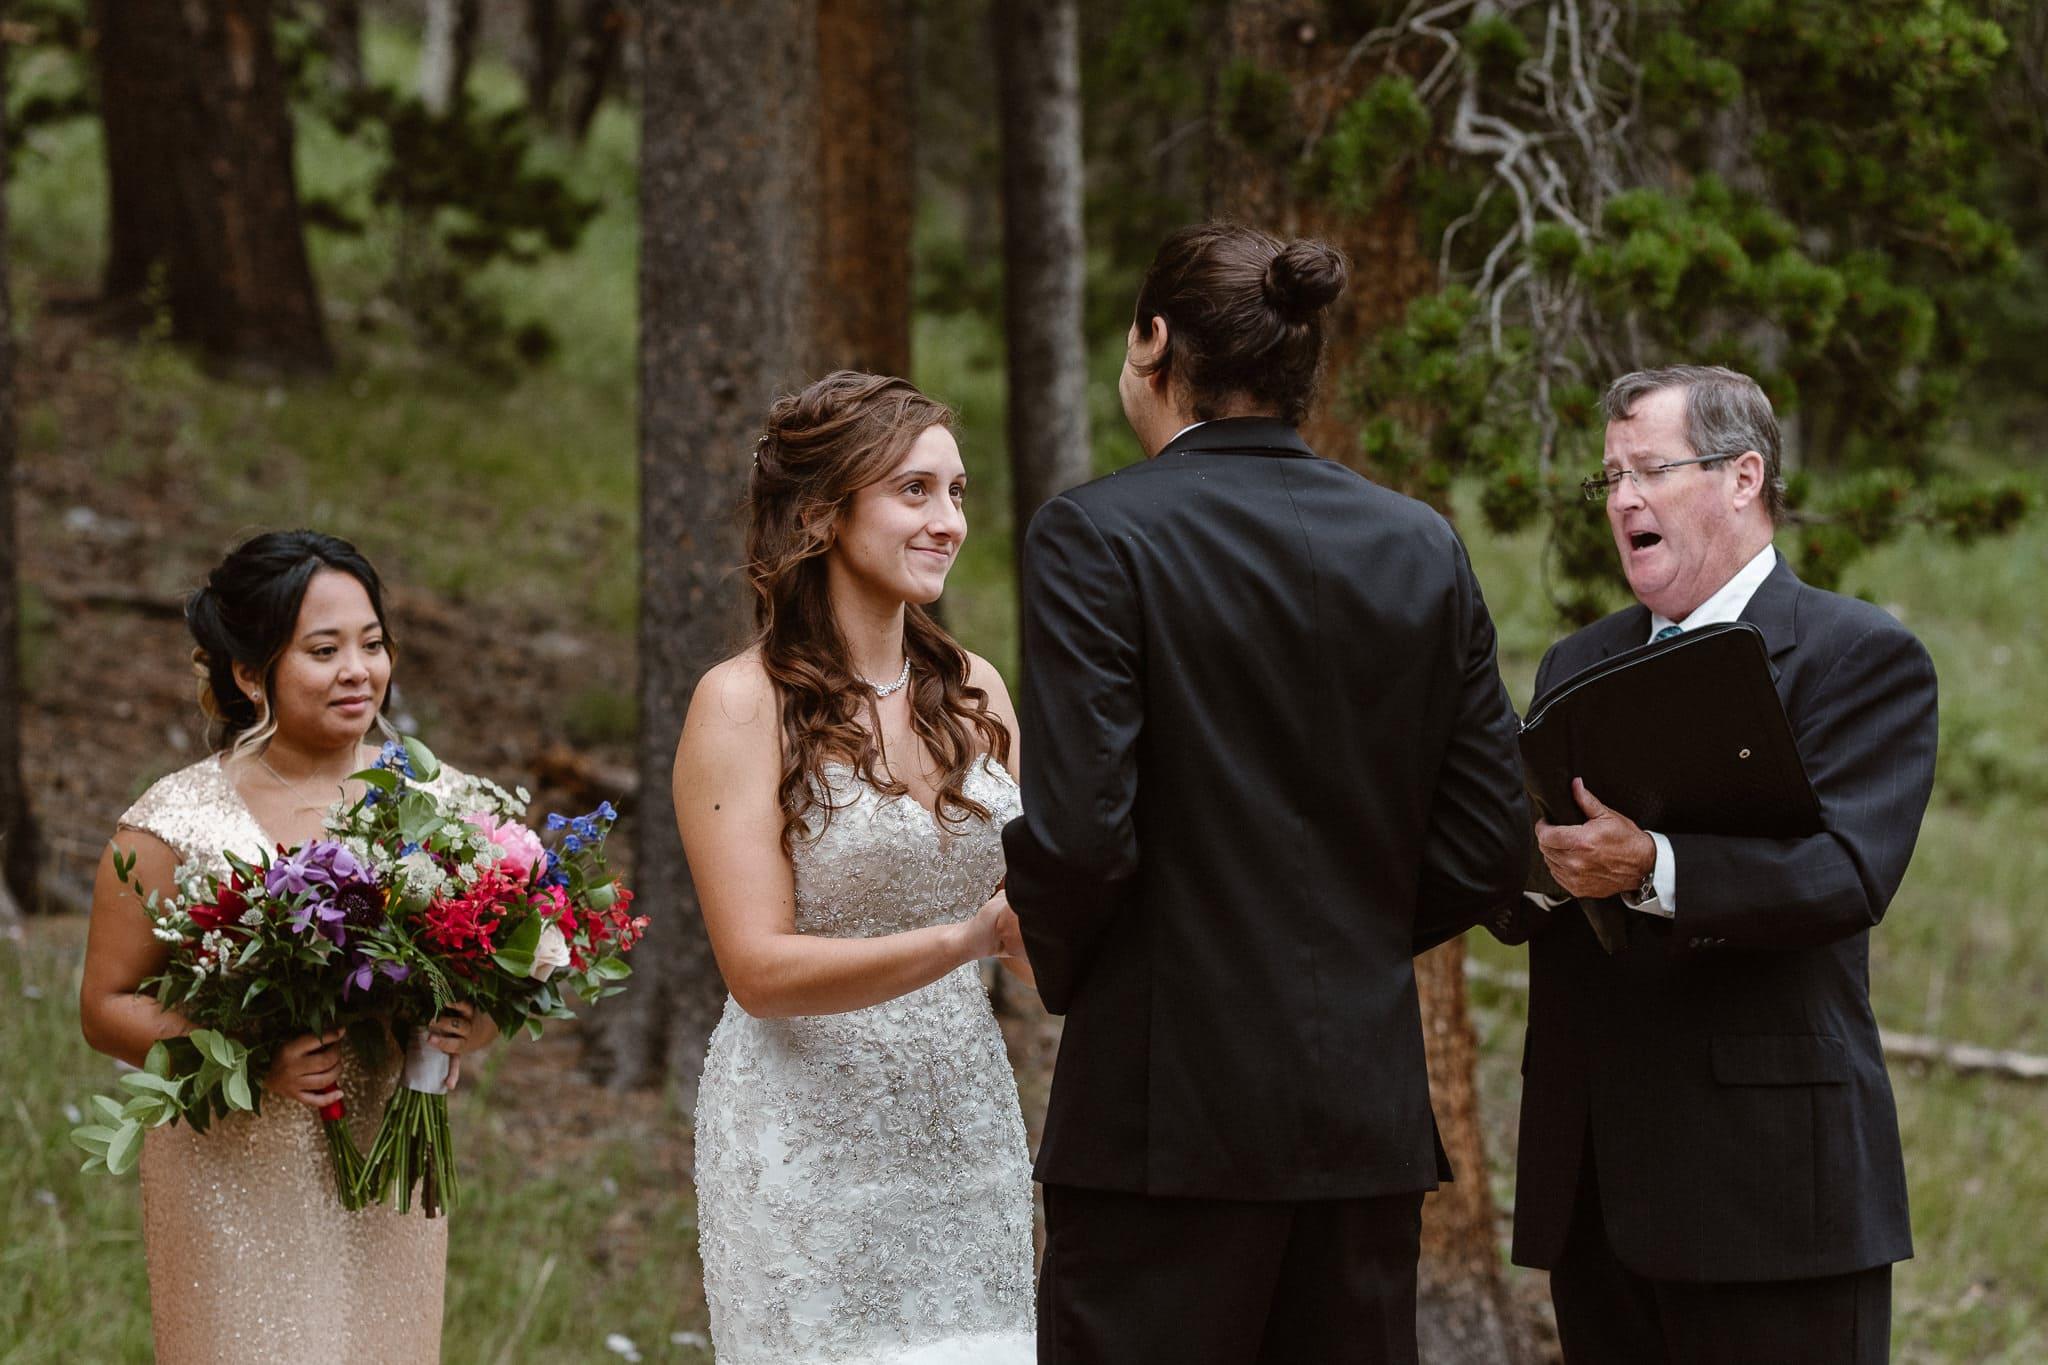 Dao House wedding photographer, Estes Park wedding venue, Colorado mountain wedding, outdoor ceremony, mountain ceremony, bride and groom exchanging vows